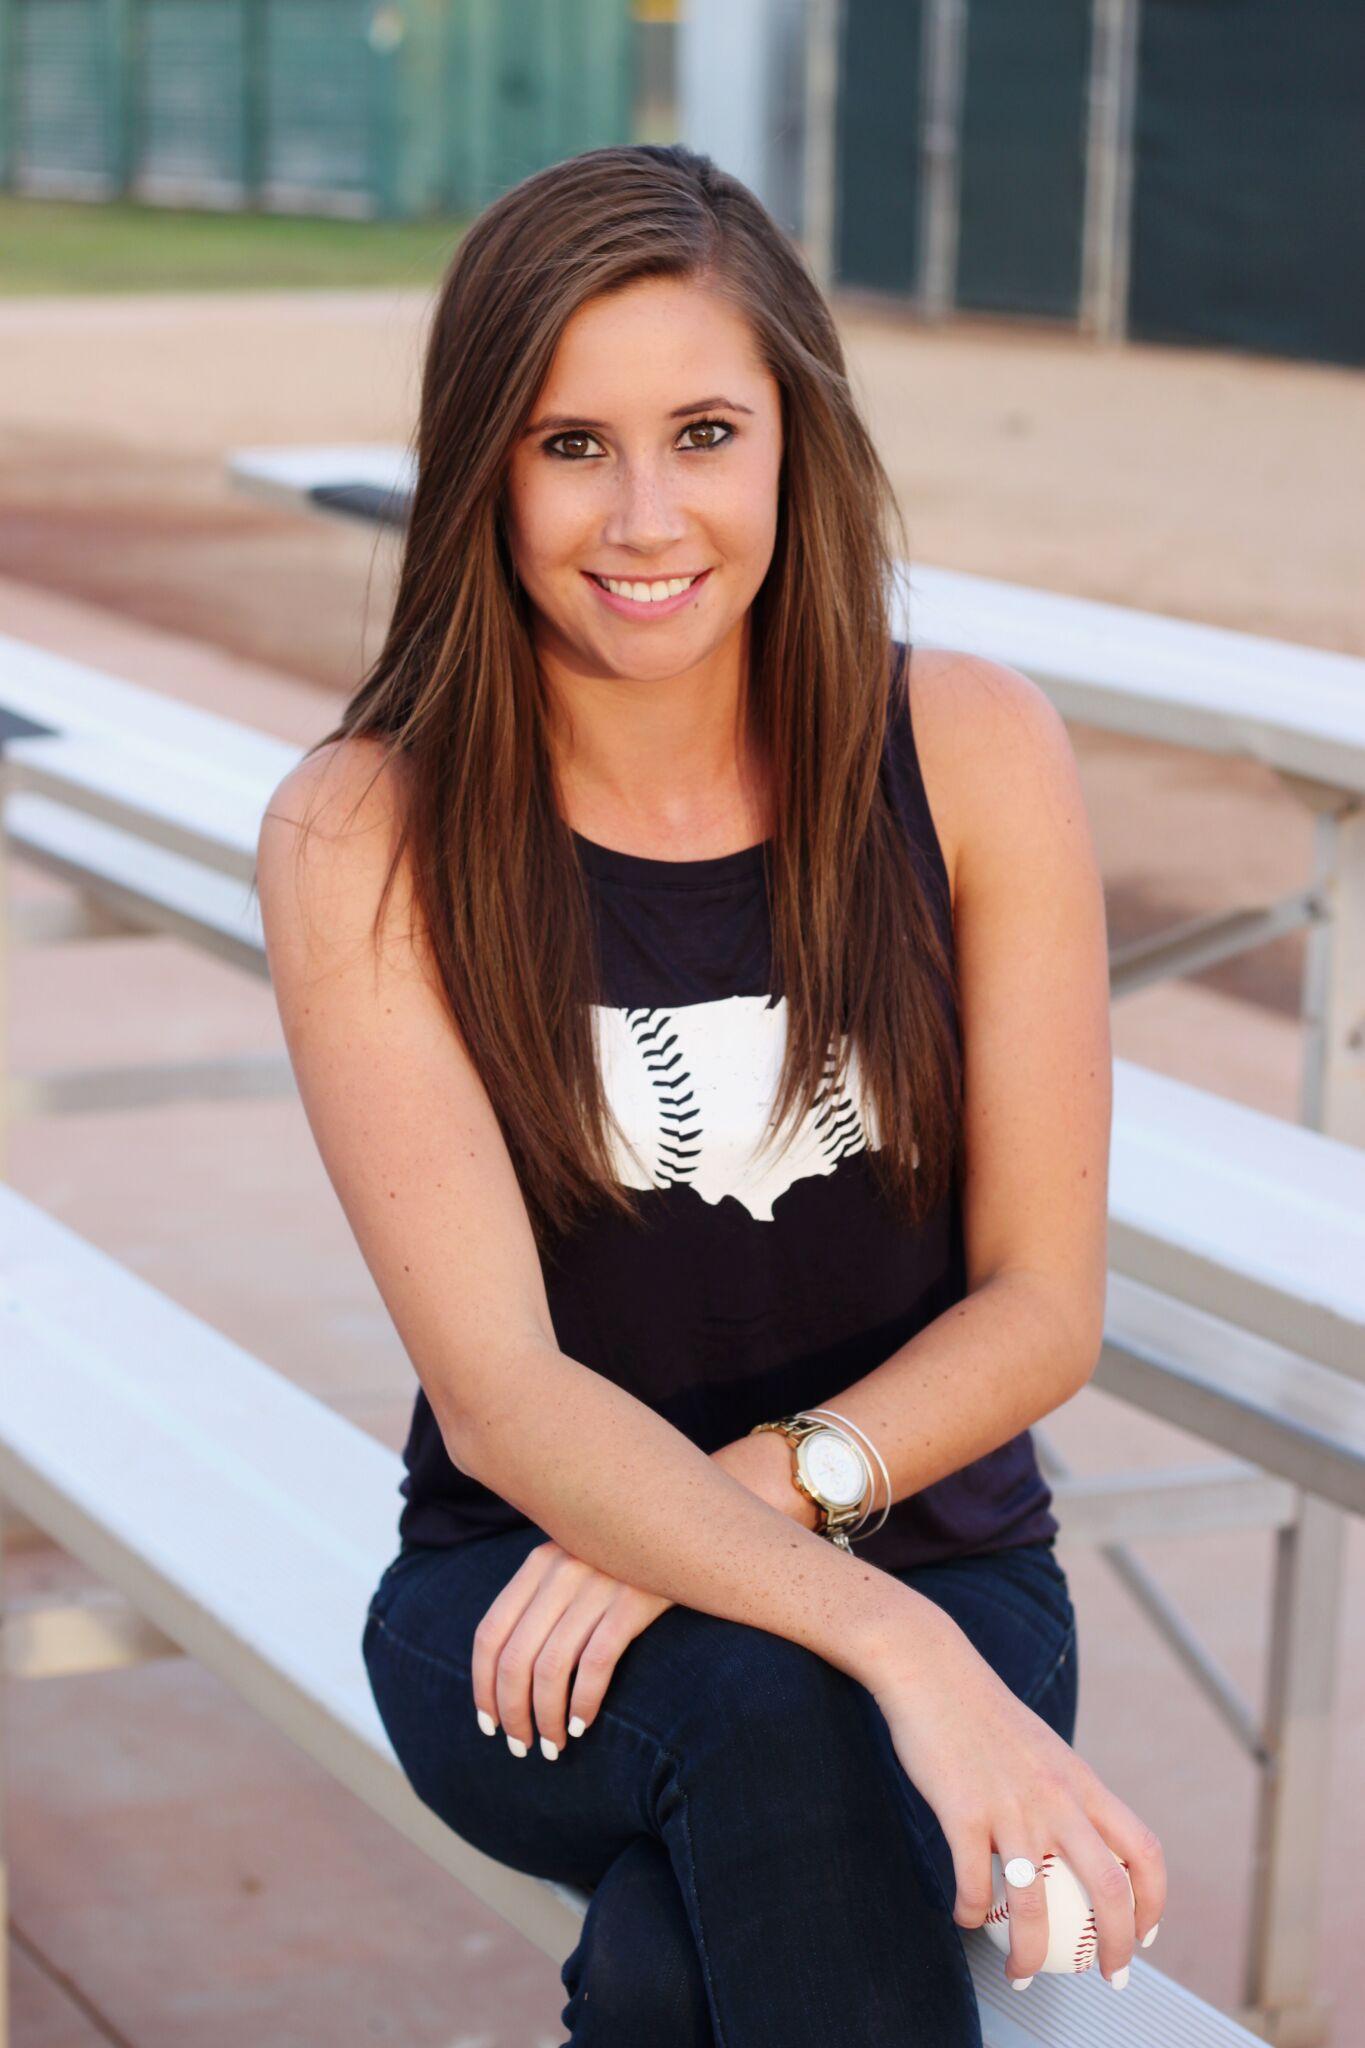 Haley Stesiak